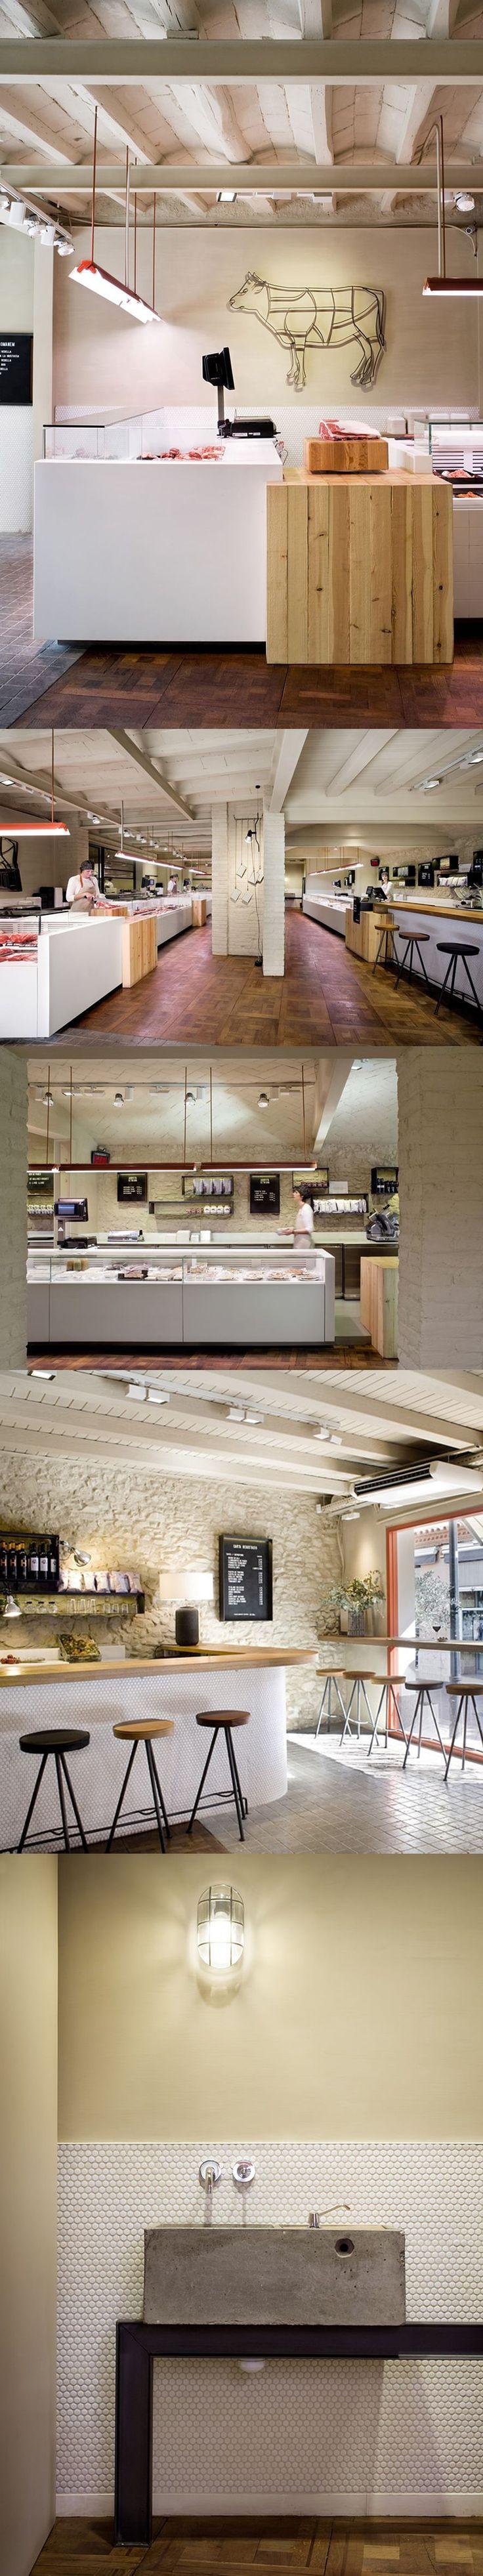 White apron penn quarter - 72 Best Images About Butcher Shops On Pinterest Apron Tutorial Red Apron And Online Butcher